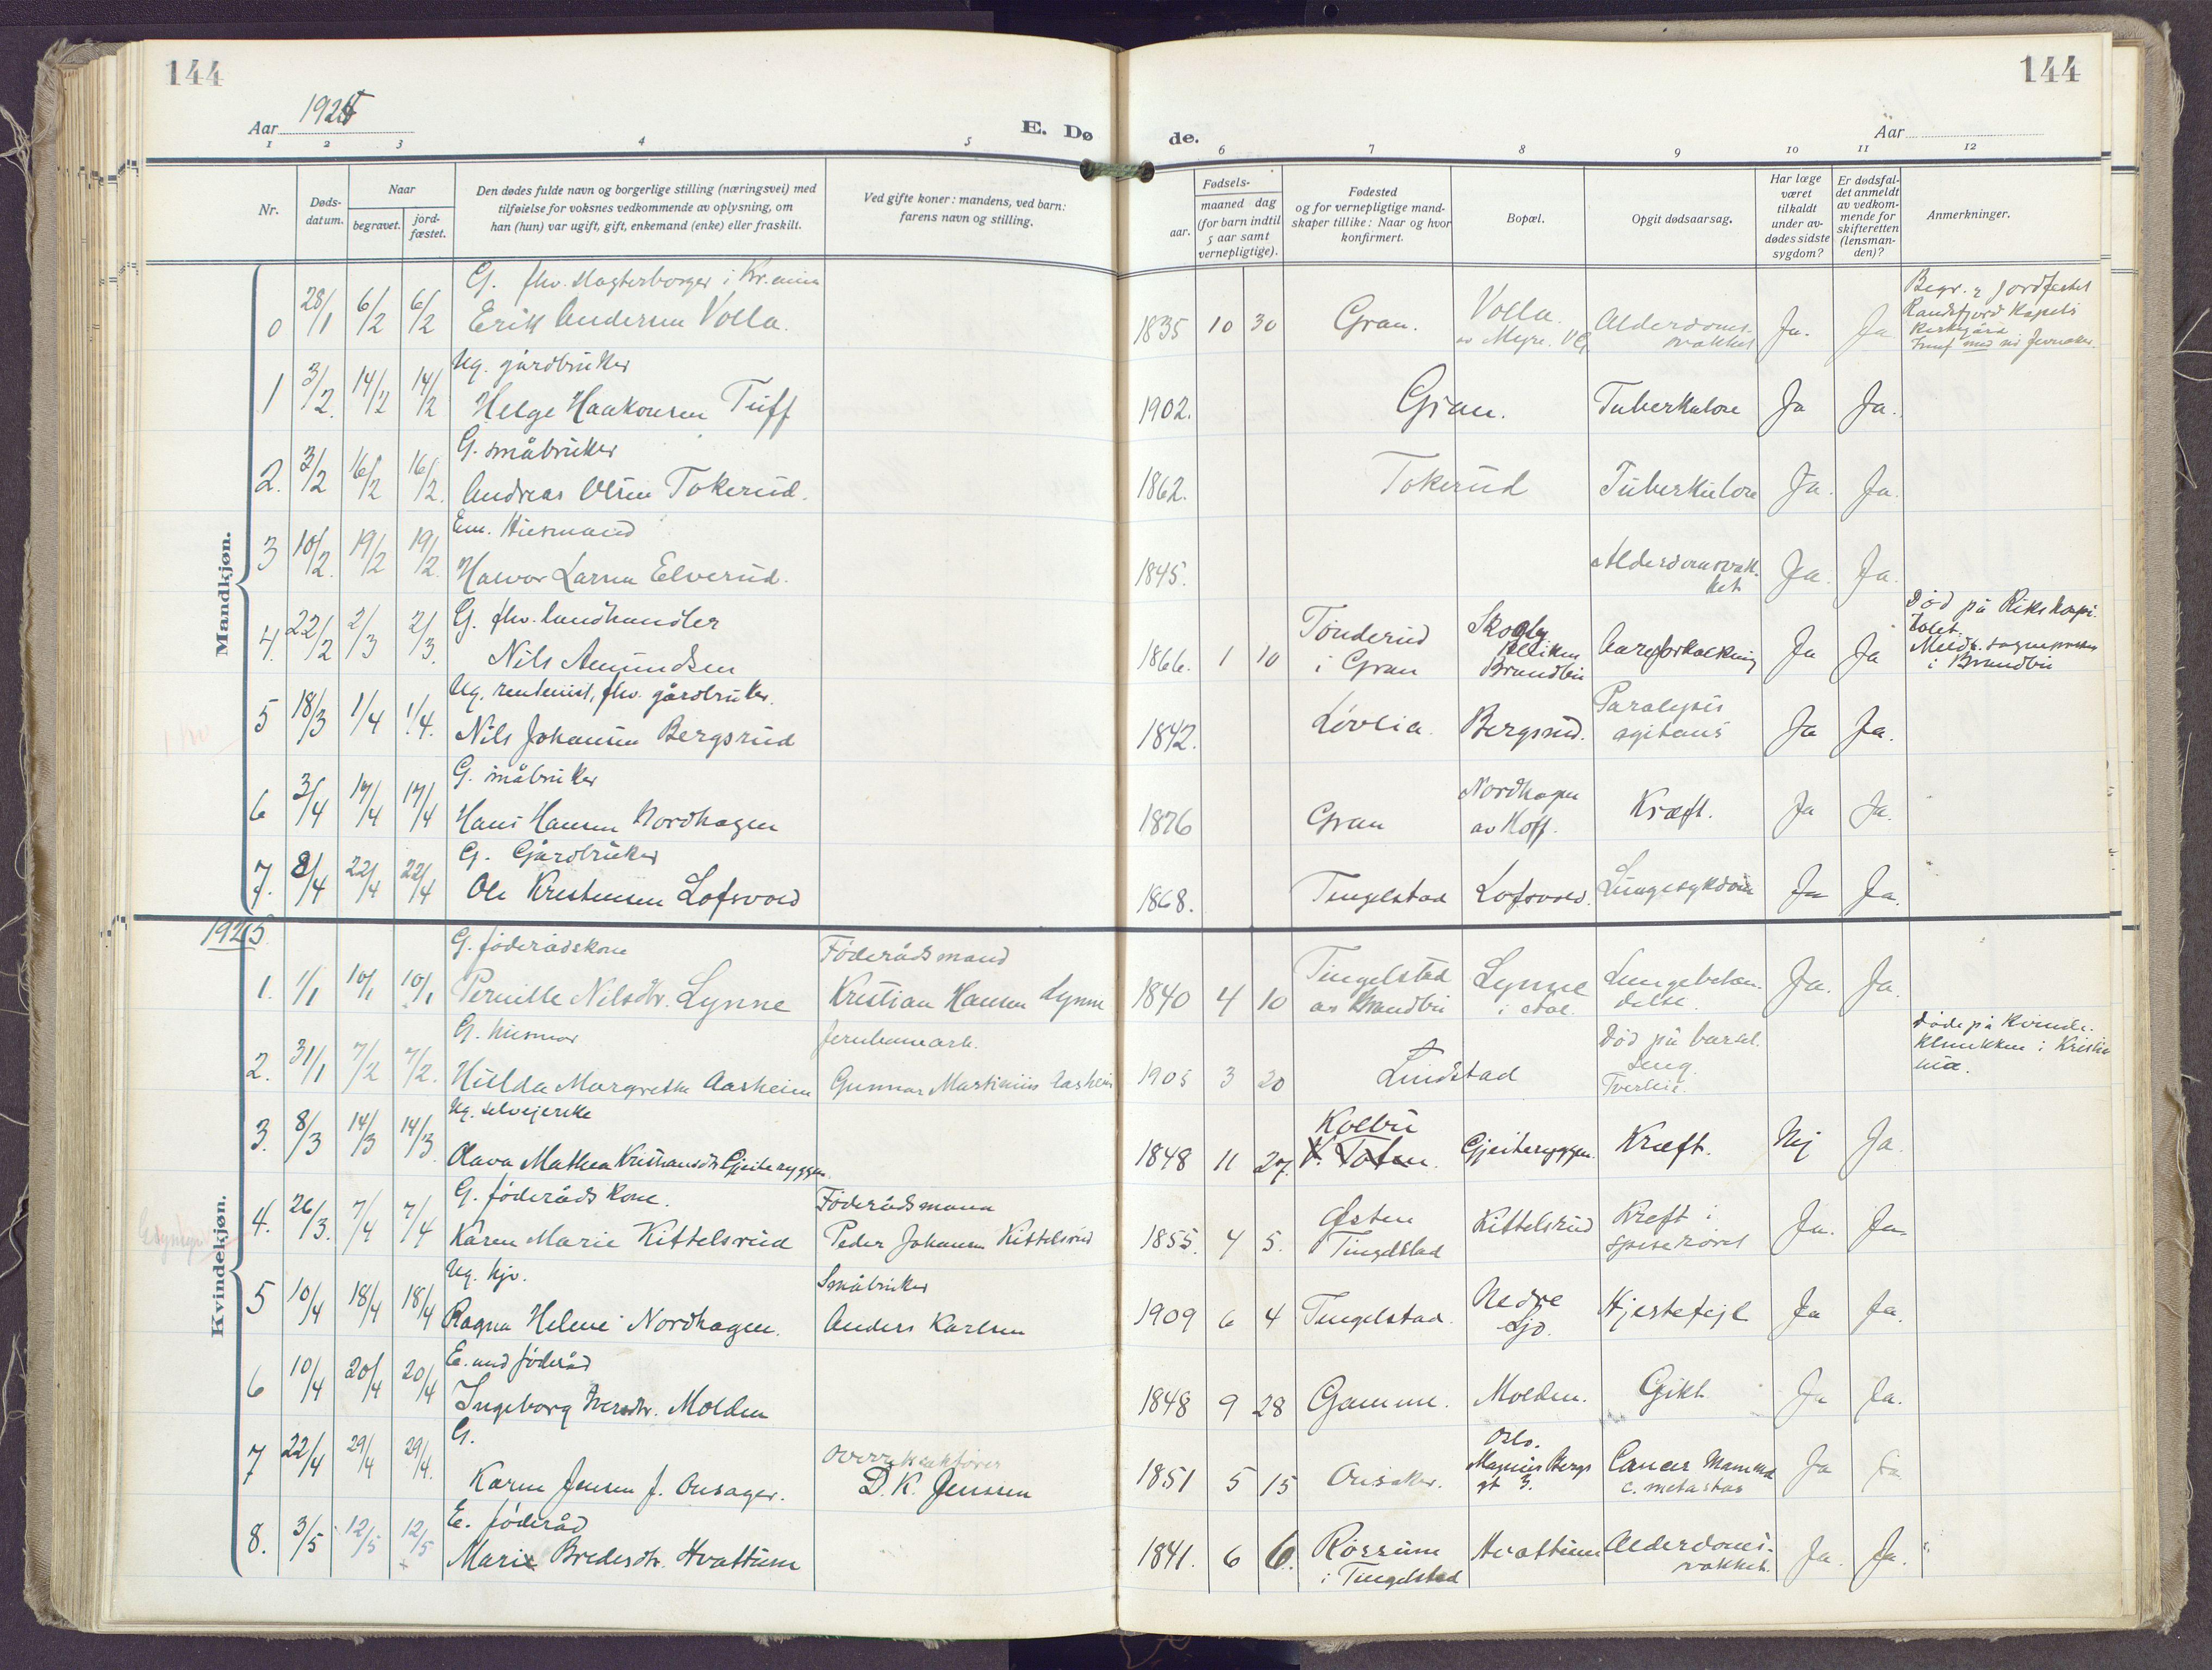 SAH, Gran prestekontor, Ministerialbok nr. 23, 1919-1938, s. 144